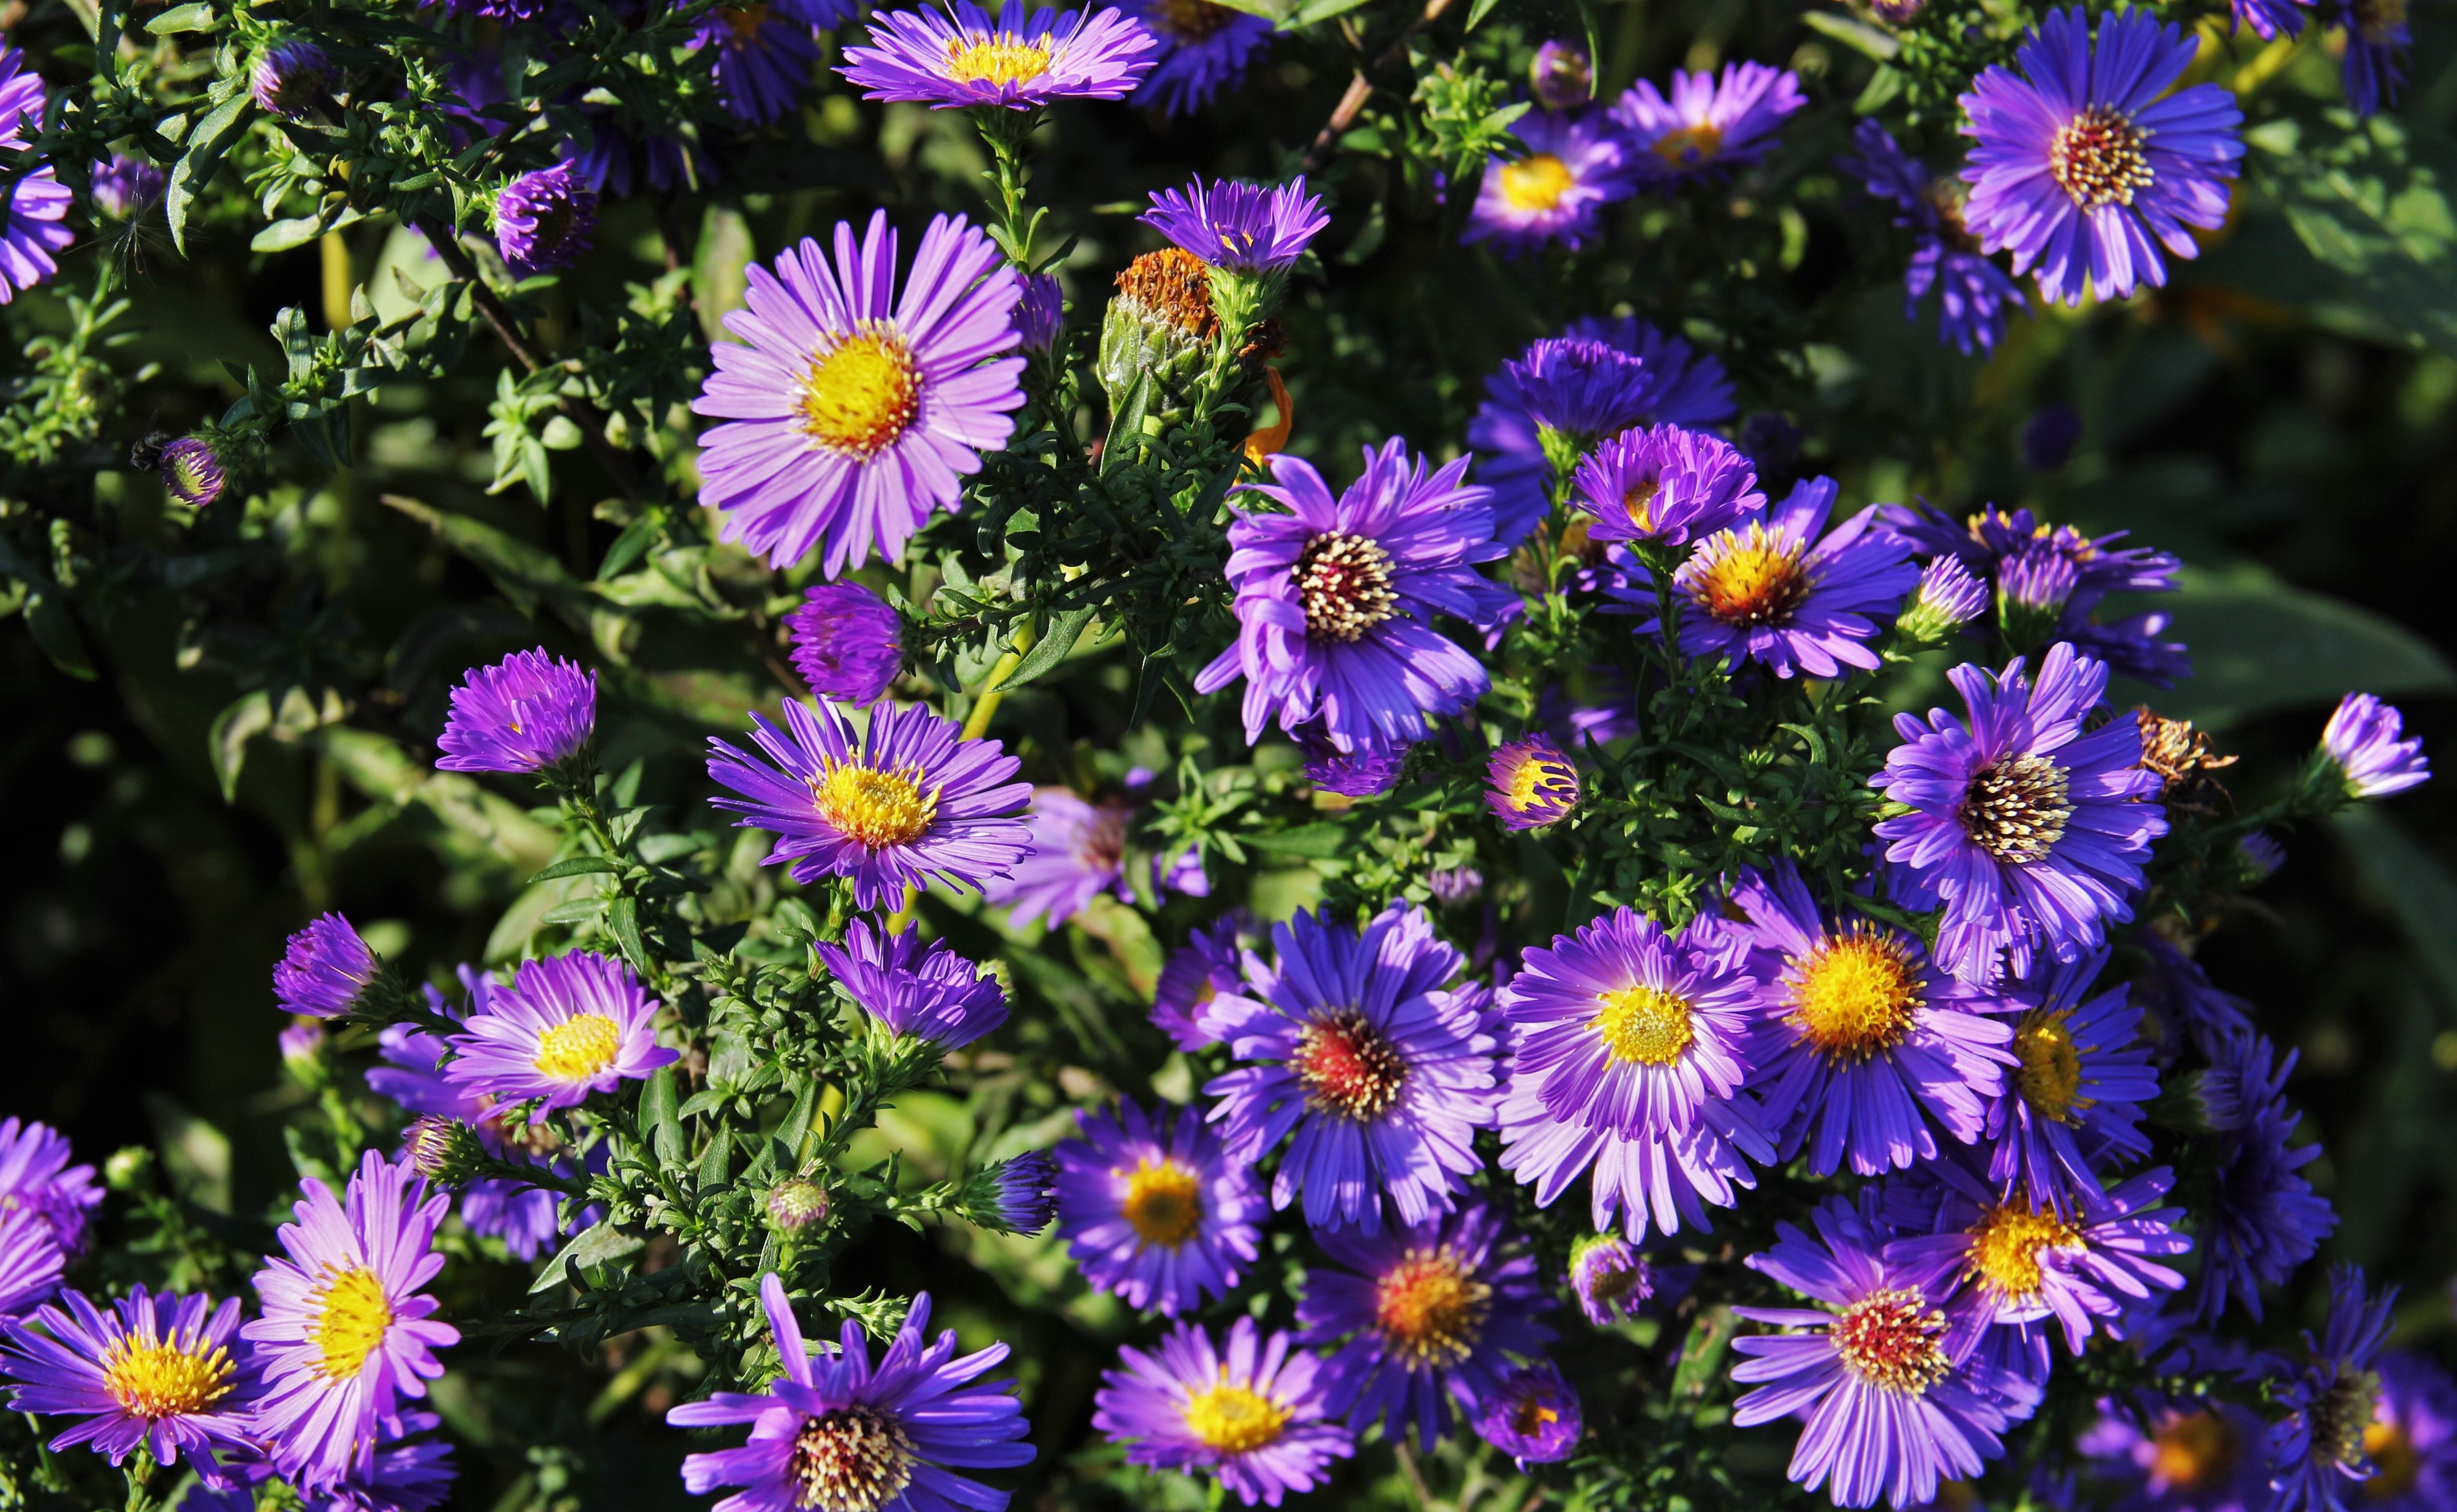 kostenlose foto : natur, wiese, blume, botanik, blau, flora ... - Garten Blumen Blau